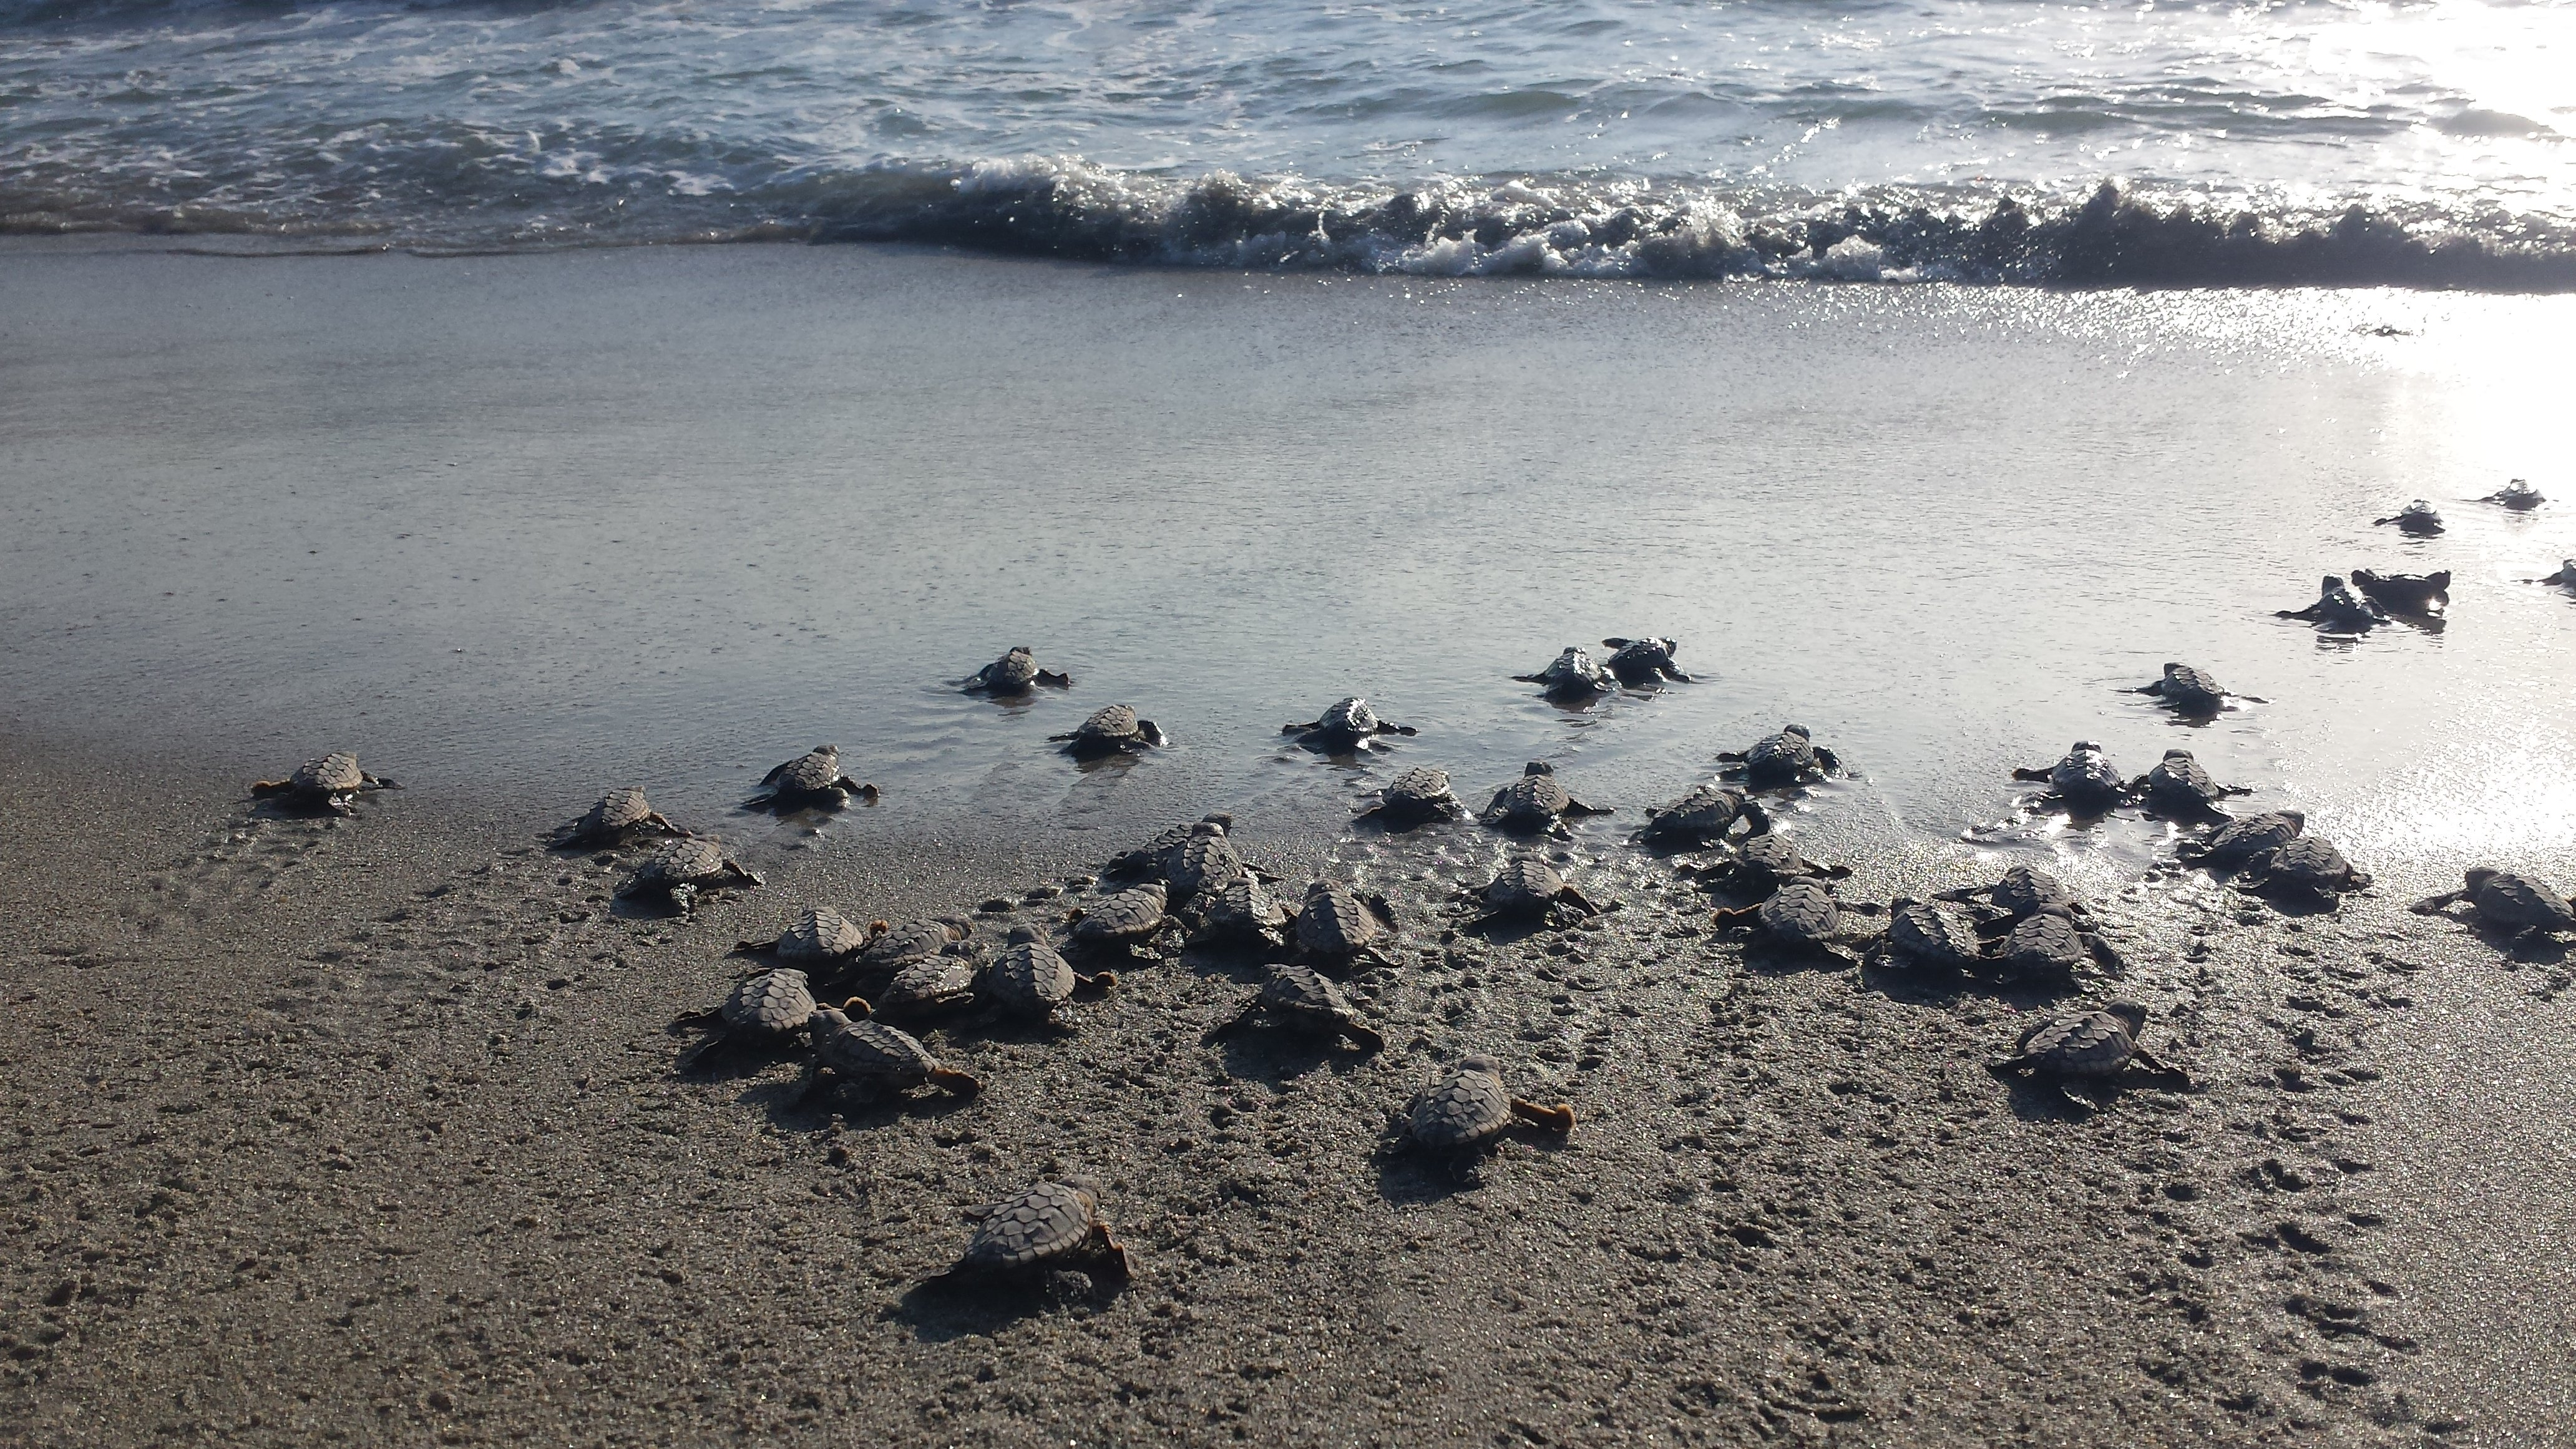 Loggerhead Marinelife Center Breaks All-Time Sea Turtle Nest Count Record -  Loggerhead Marinelife Center